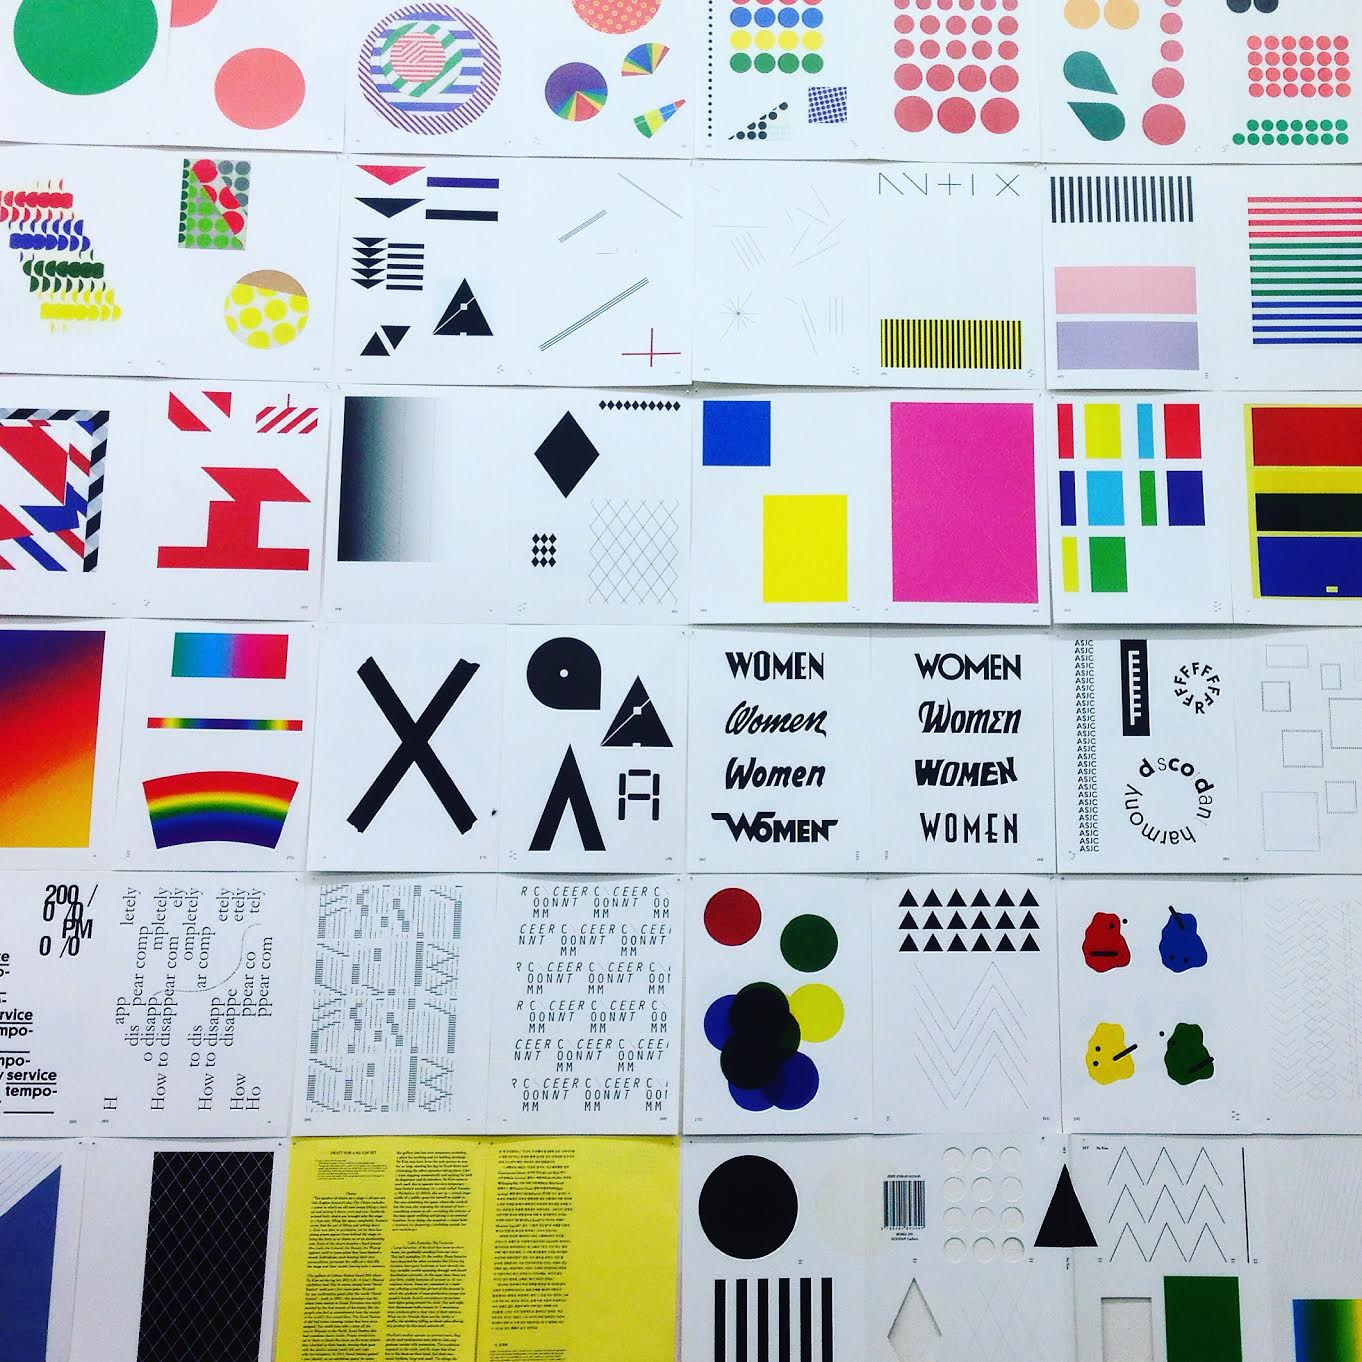 Go to design events - NY art book fair